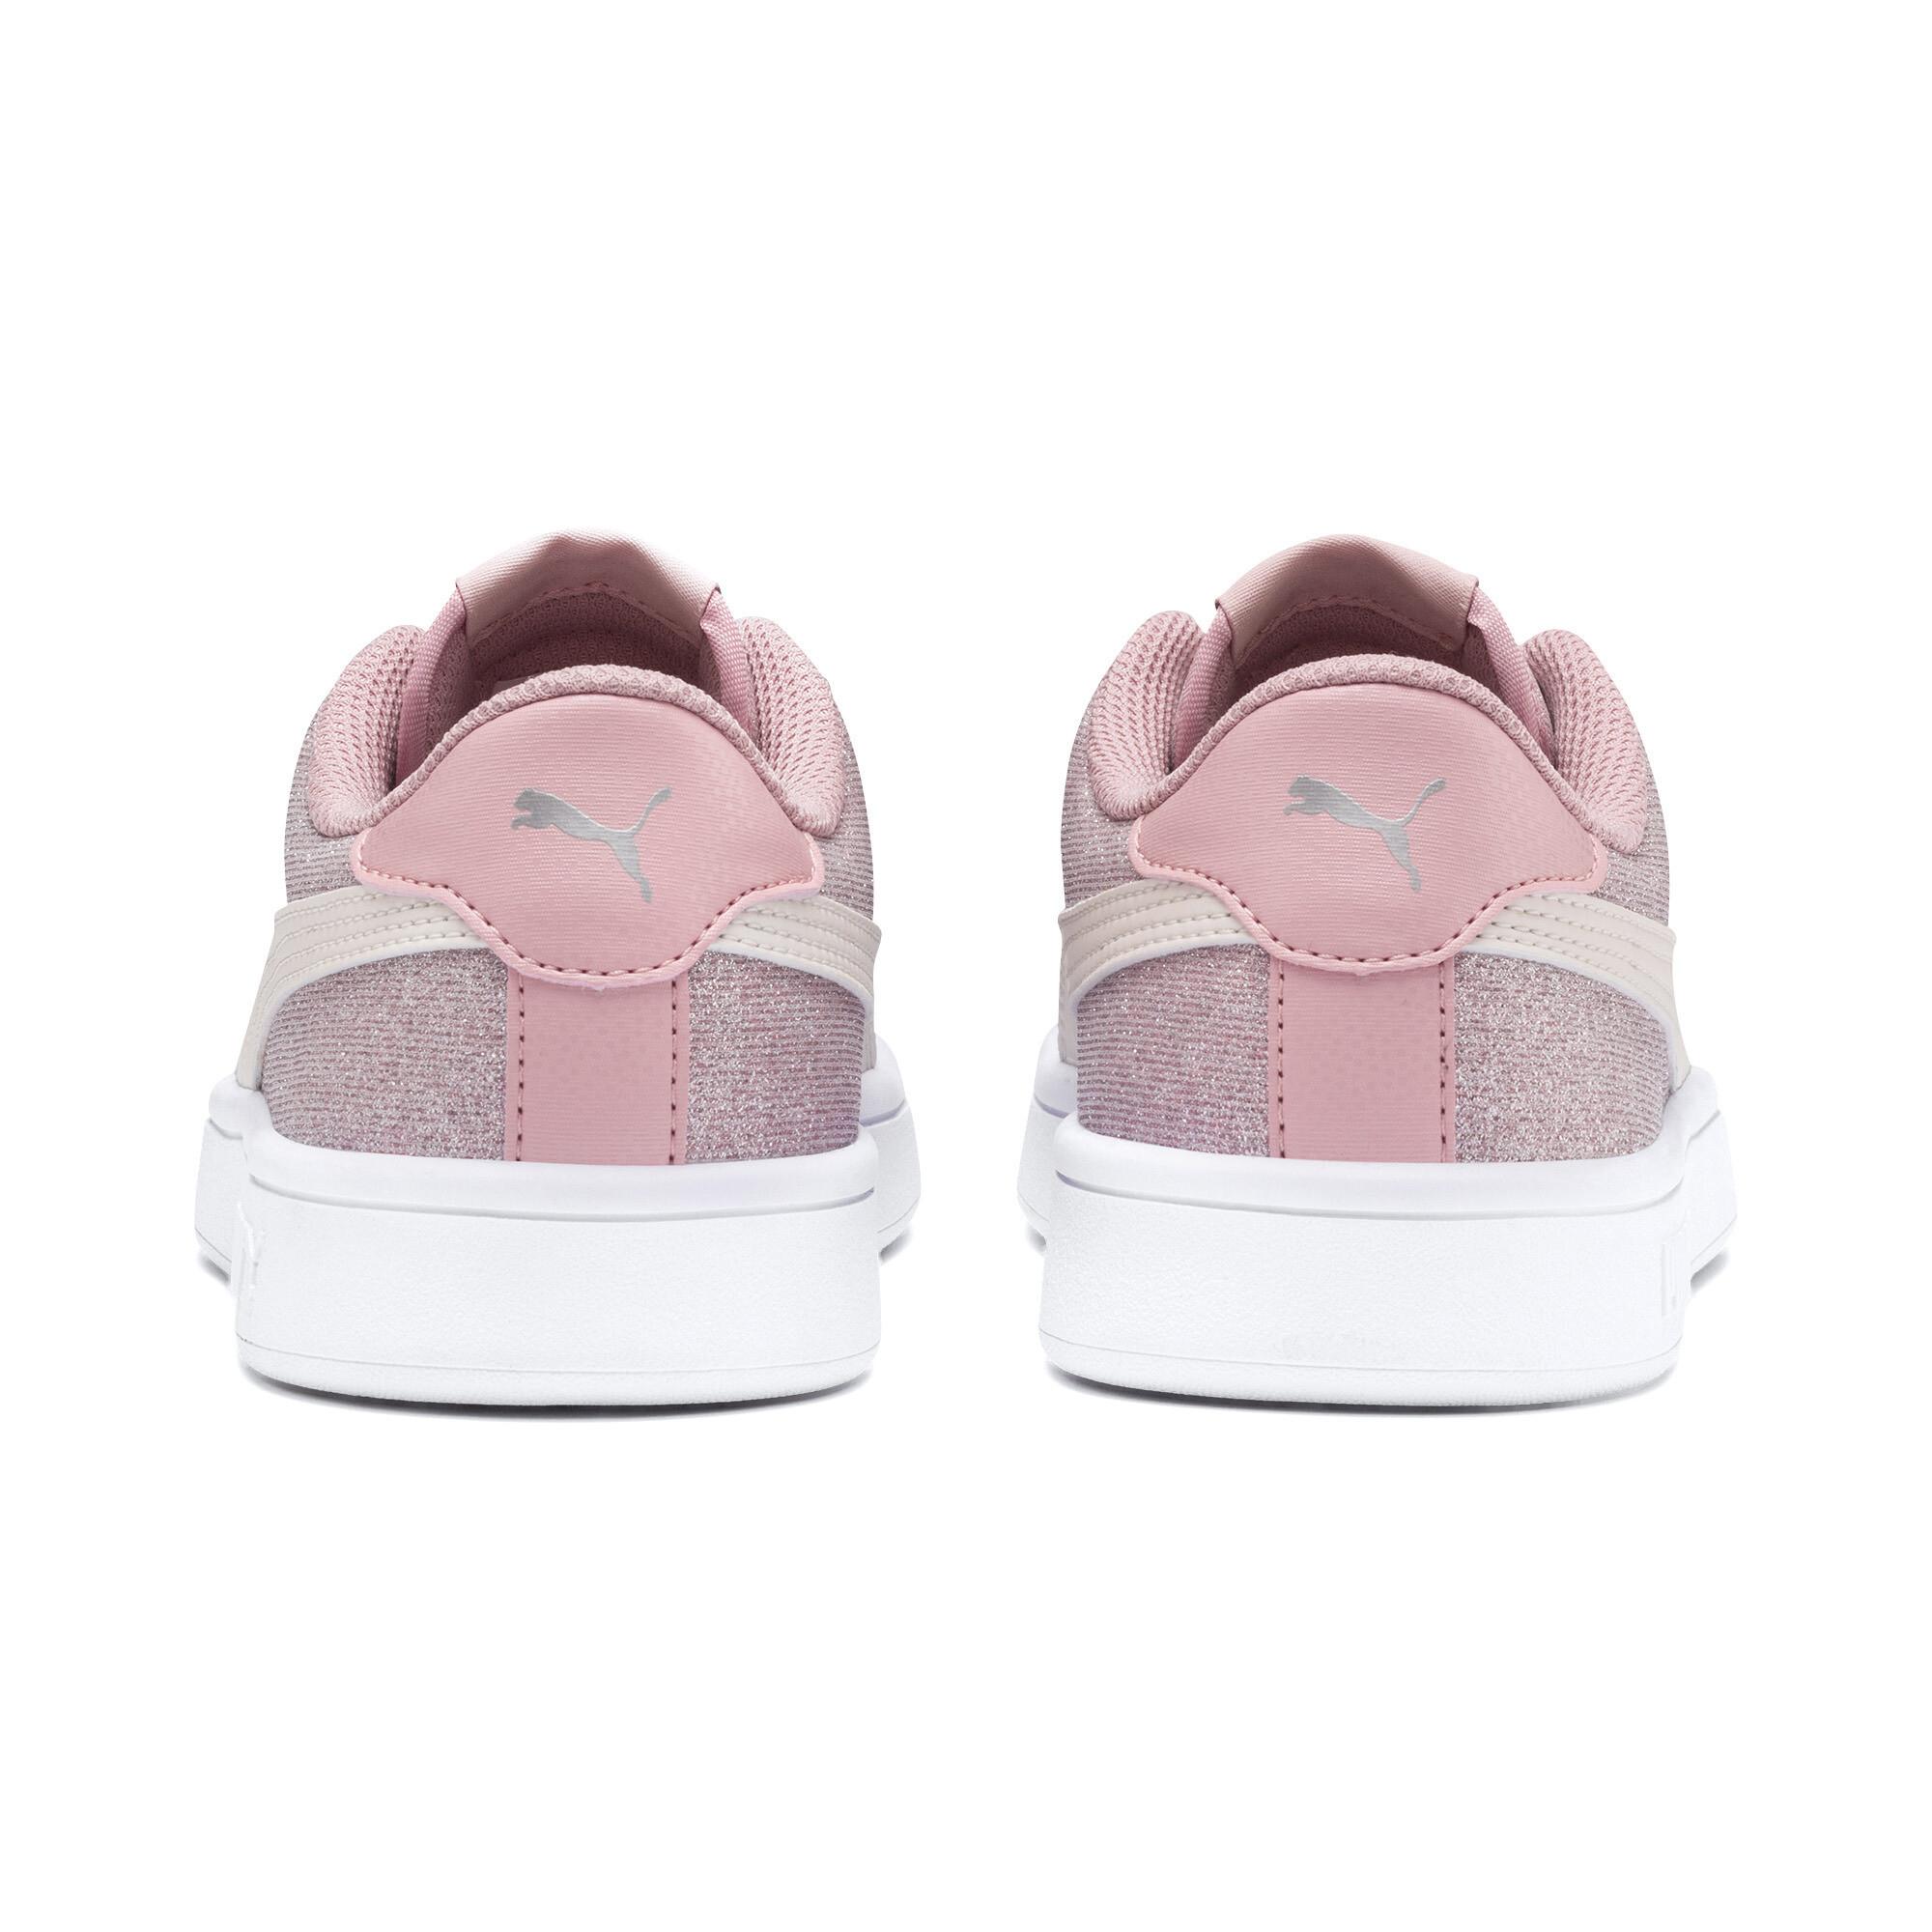 PUMA-Smash-v2-Glitz-Glam-Sneakers-JR-Girls-Shoe-Kids thumbnail 13